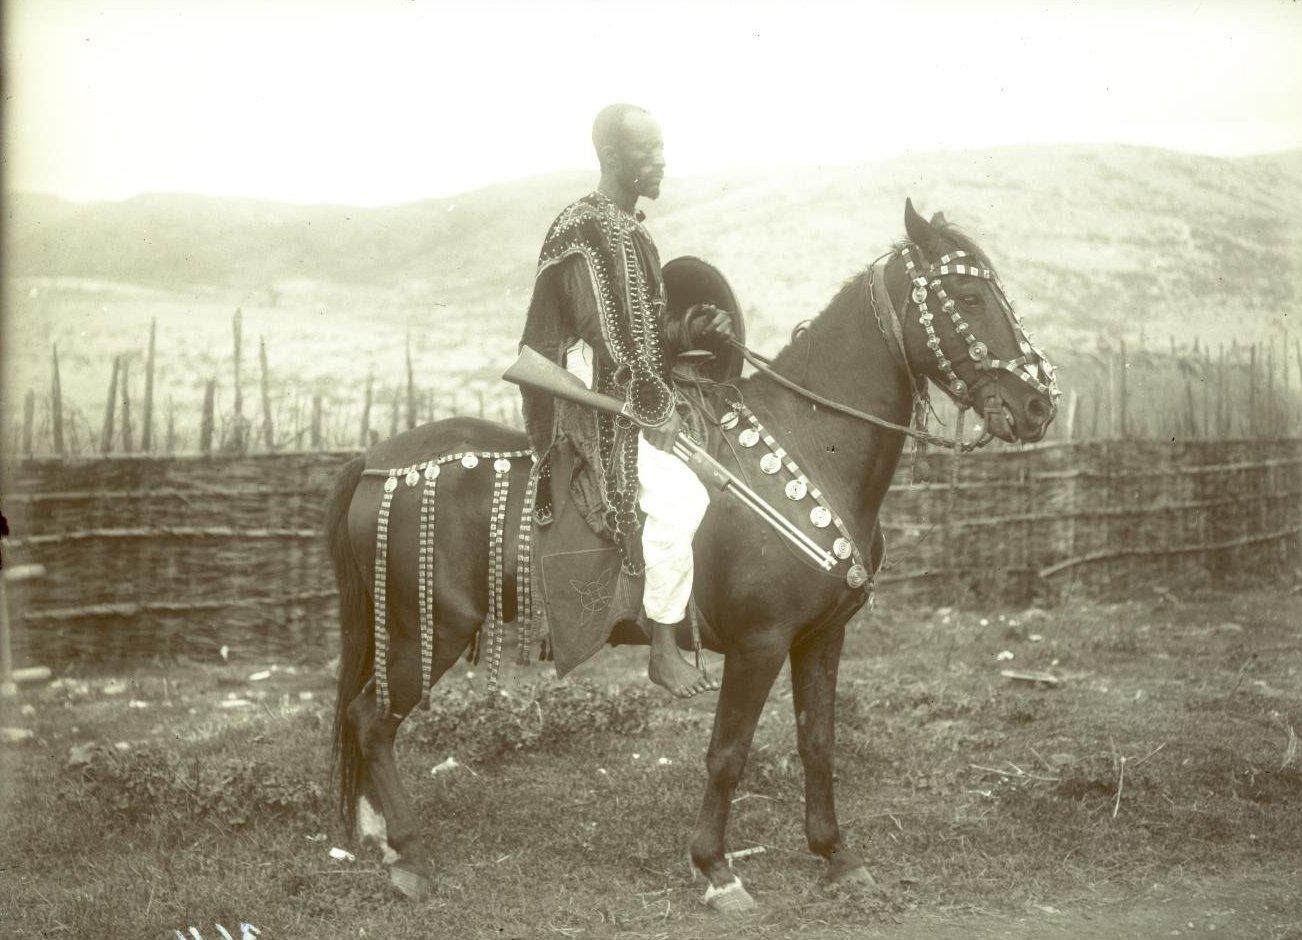 364. 1899. Абиссиния, Аддис-Абеба. Абиссинский кавалерист. Галла